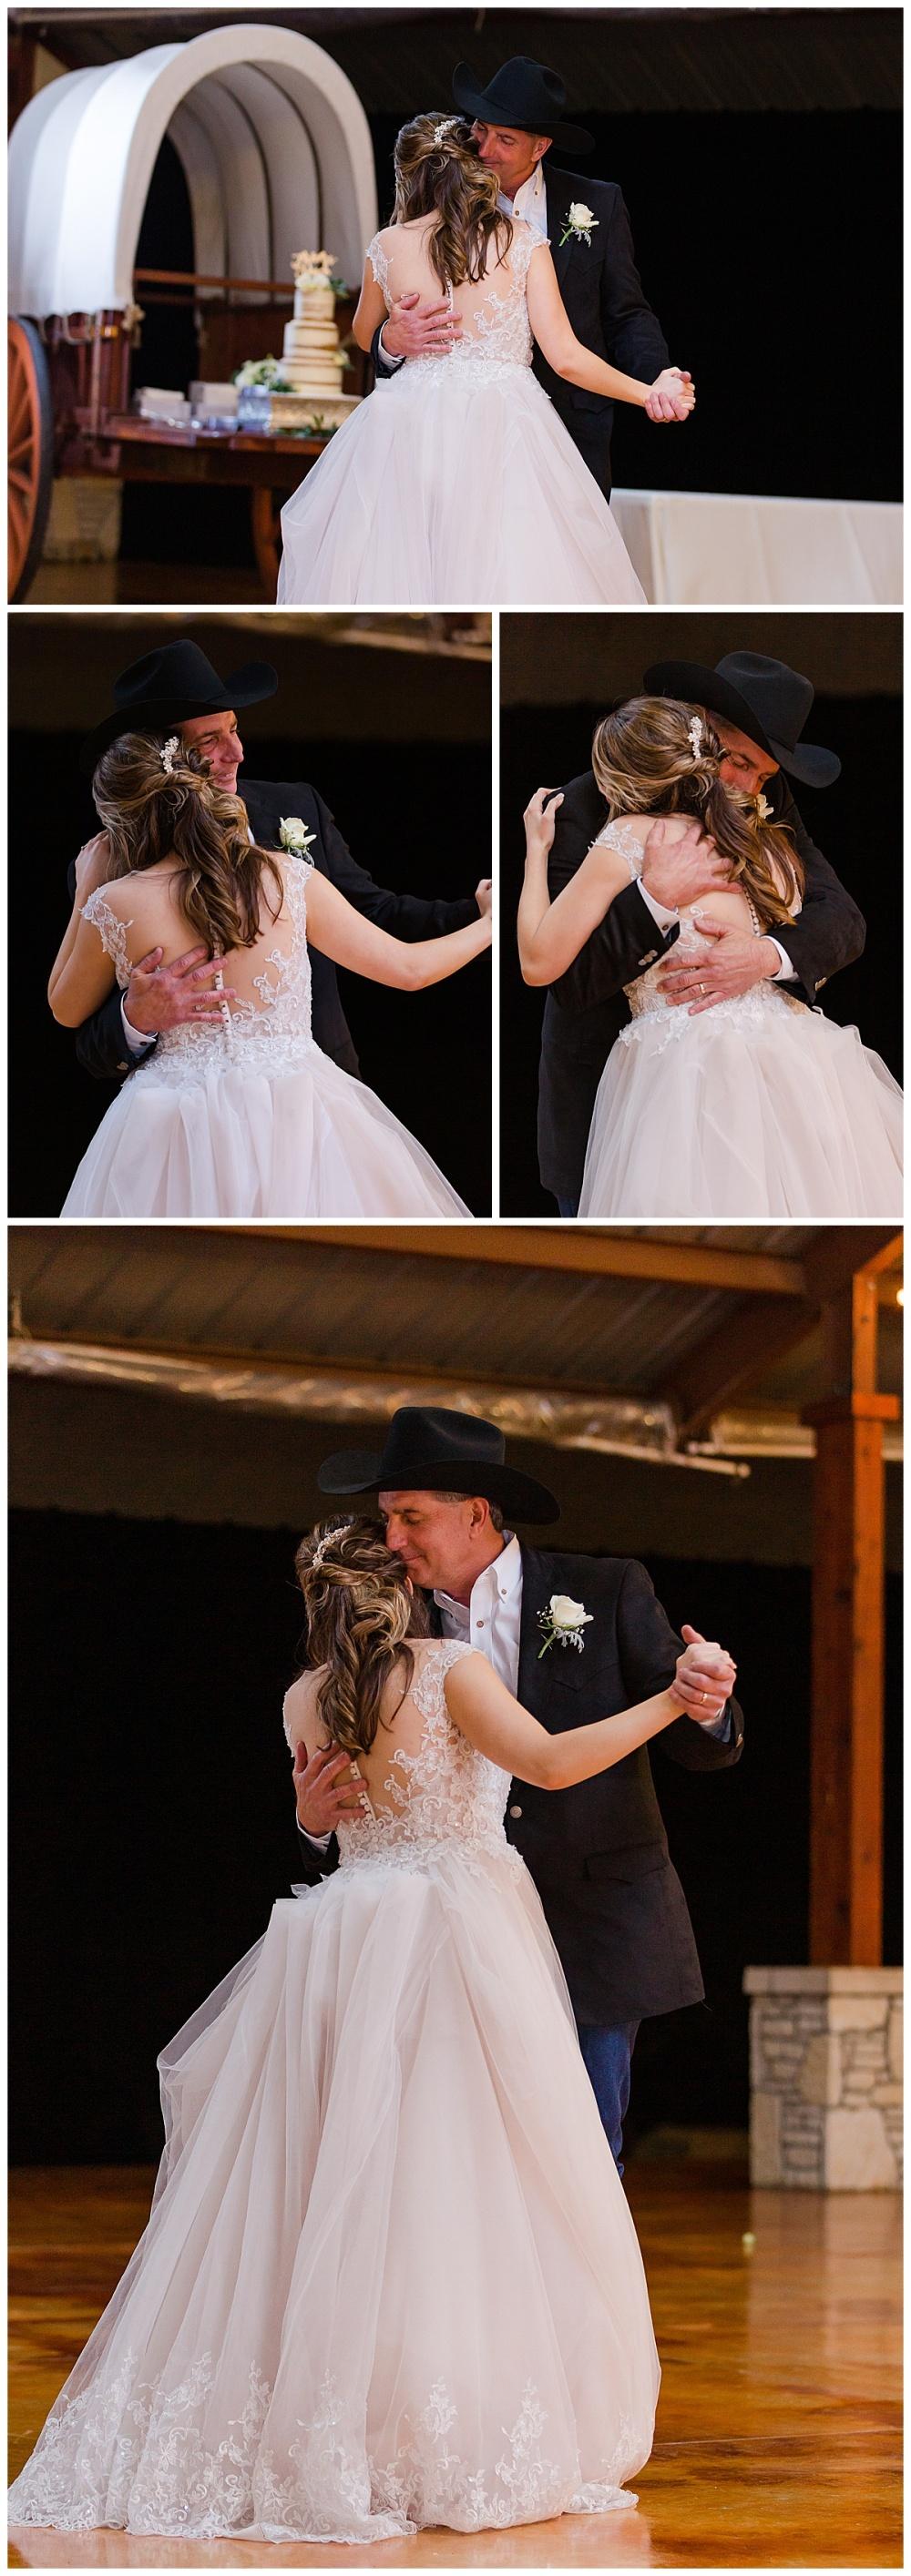 Wedding-Photographer-Texas-Hill-Country-Happy-H-Ranch-Comfor-Texas-Carly-Barton-Photography_0075.jpg